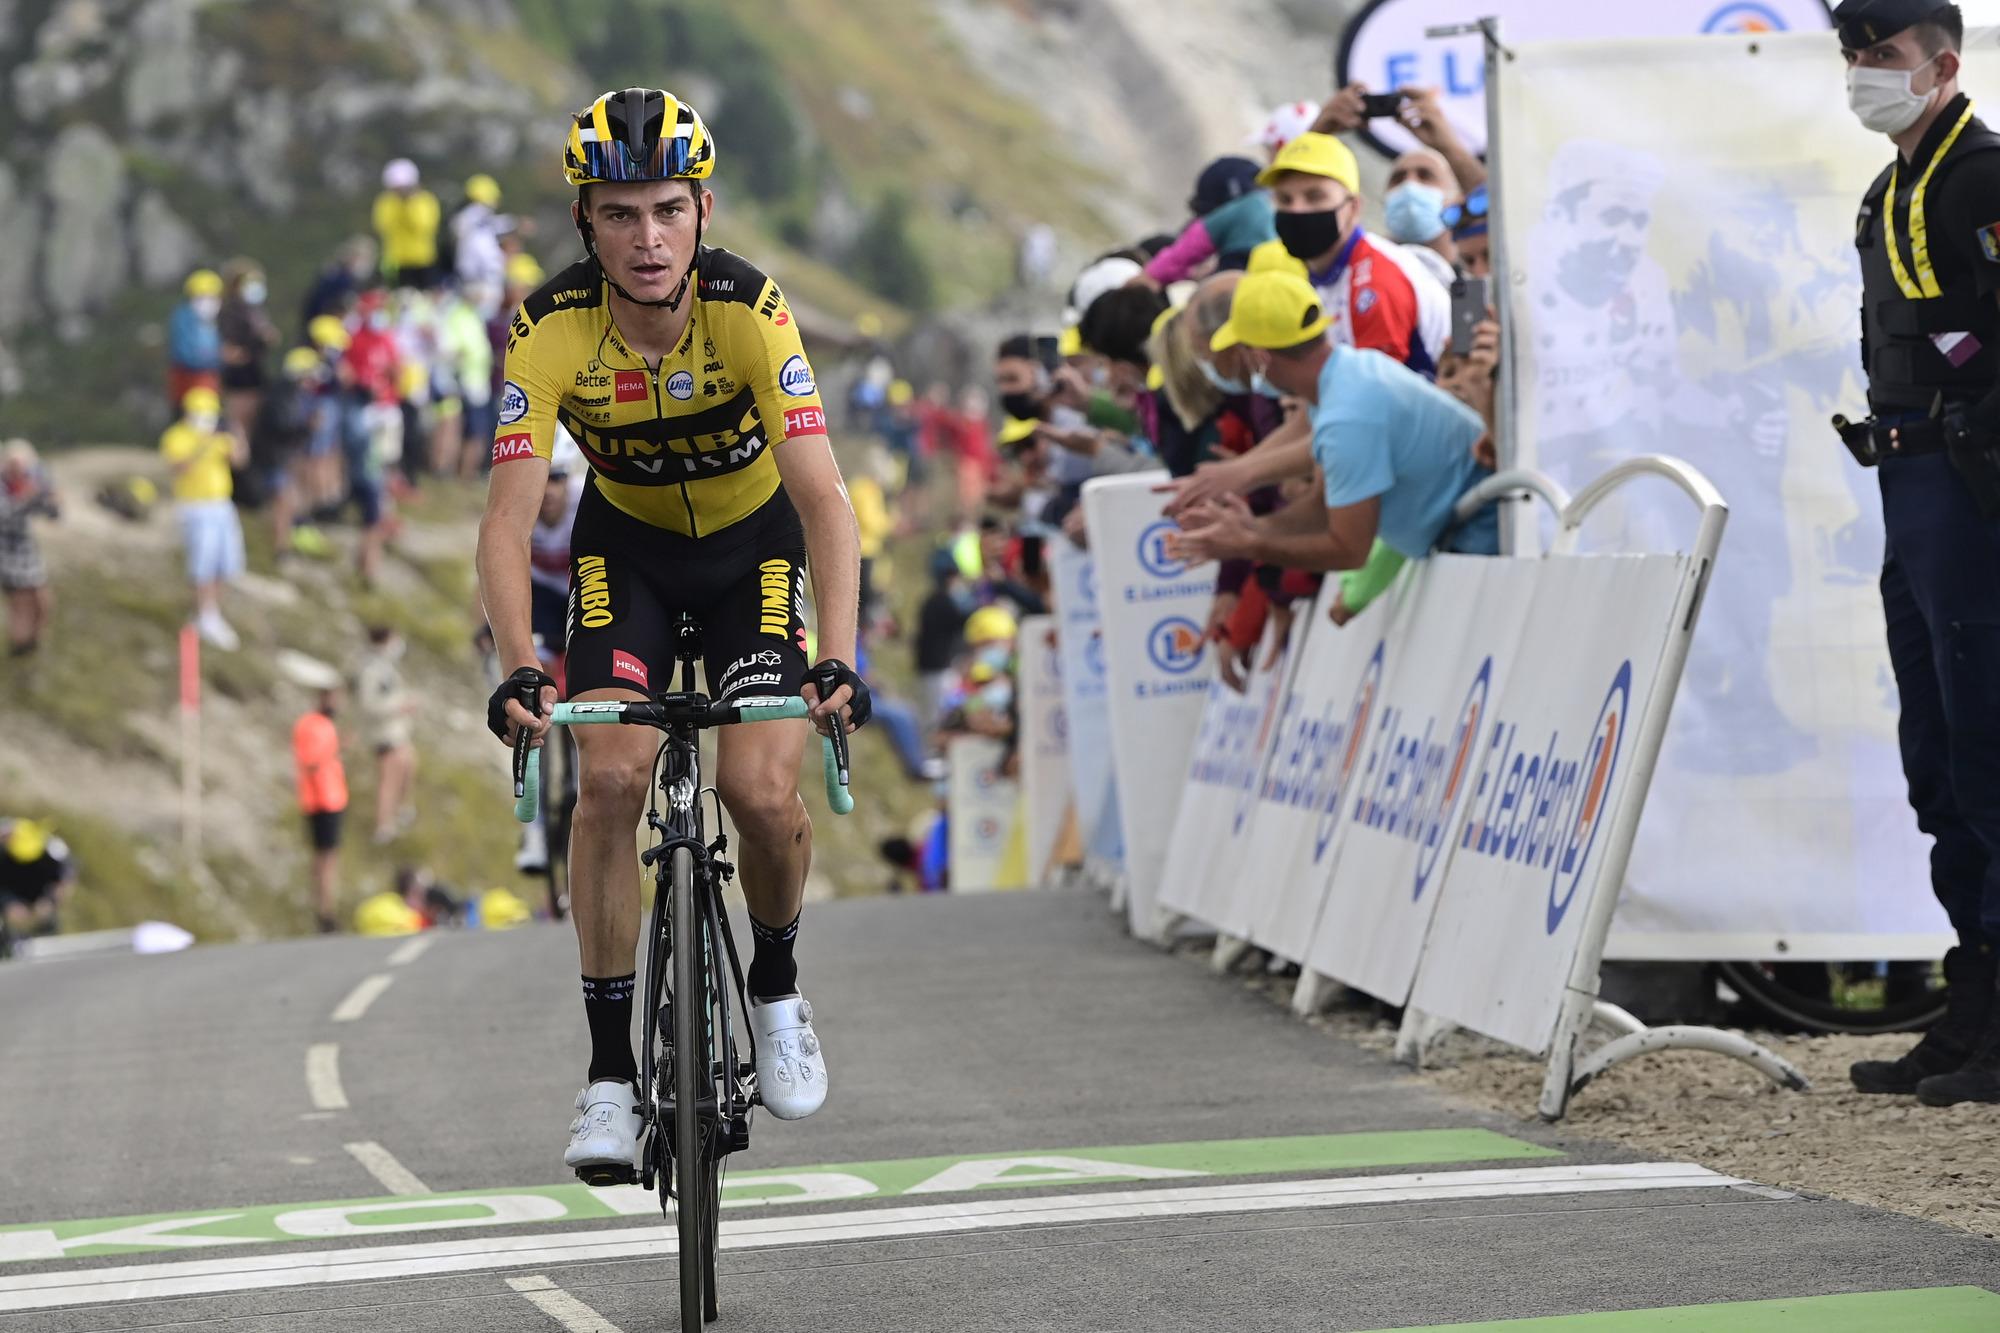 Tour de France 2020 - 107th Edition - 16th stage Grenoble - Meribel - Col de la Loze 170 km - 16/09/2020 - Sepp Kuss (USA - Team Jumbo - Visma) - photo POOL/BettiniPhoto©2020